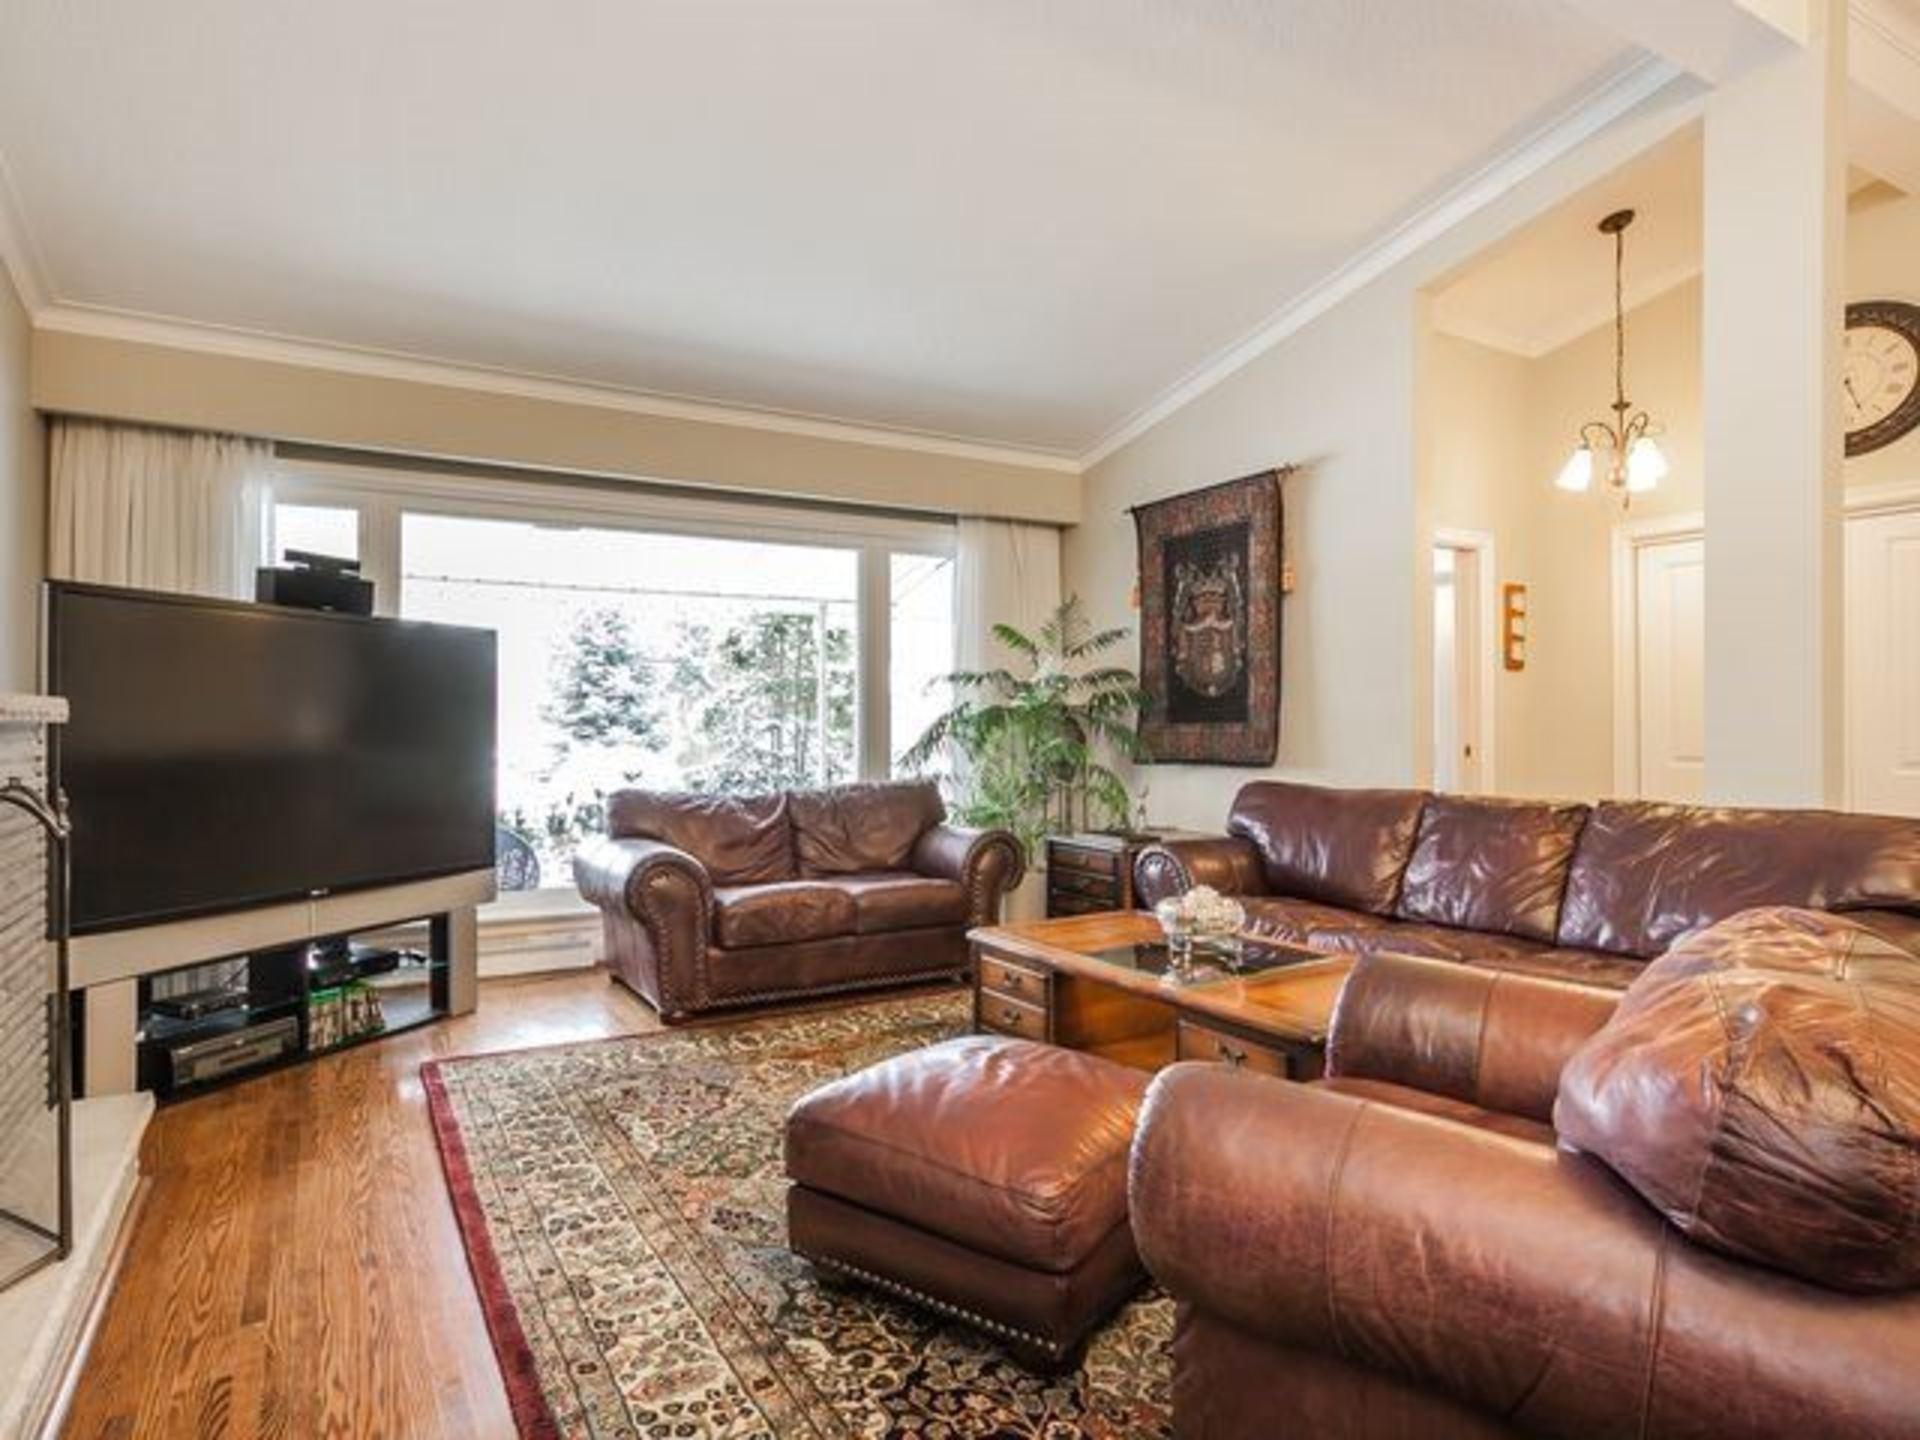 c3710018_3 at SALE # 453 - 56 Burbank Drive, Bayview Village, Toronto